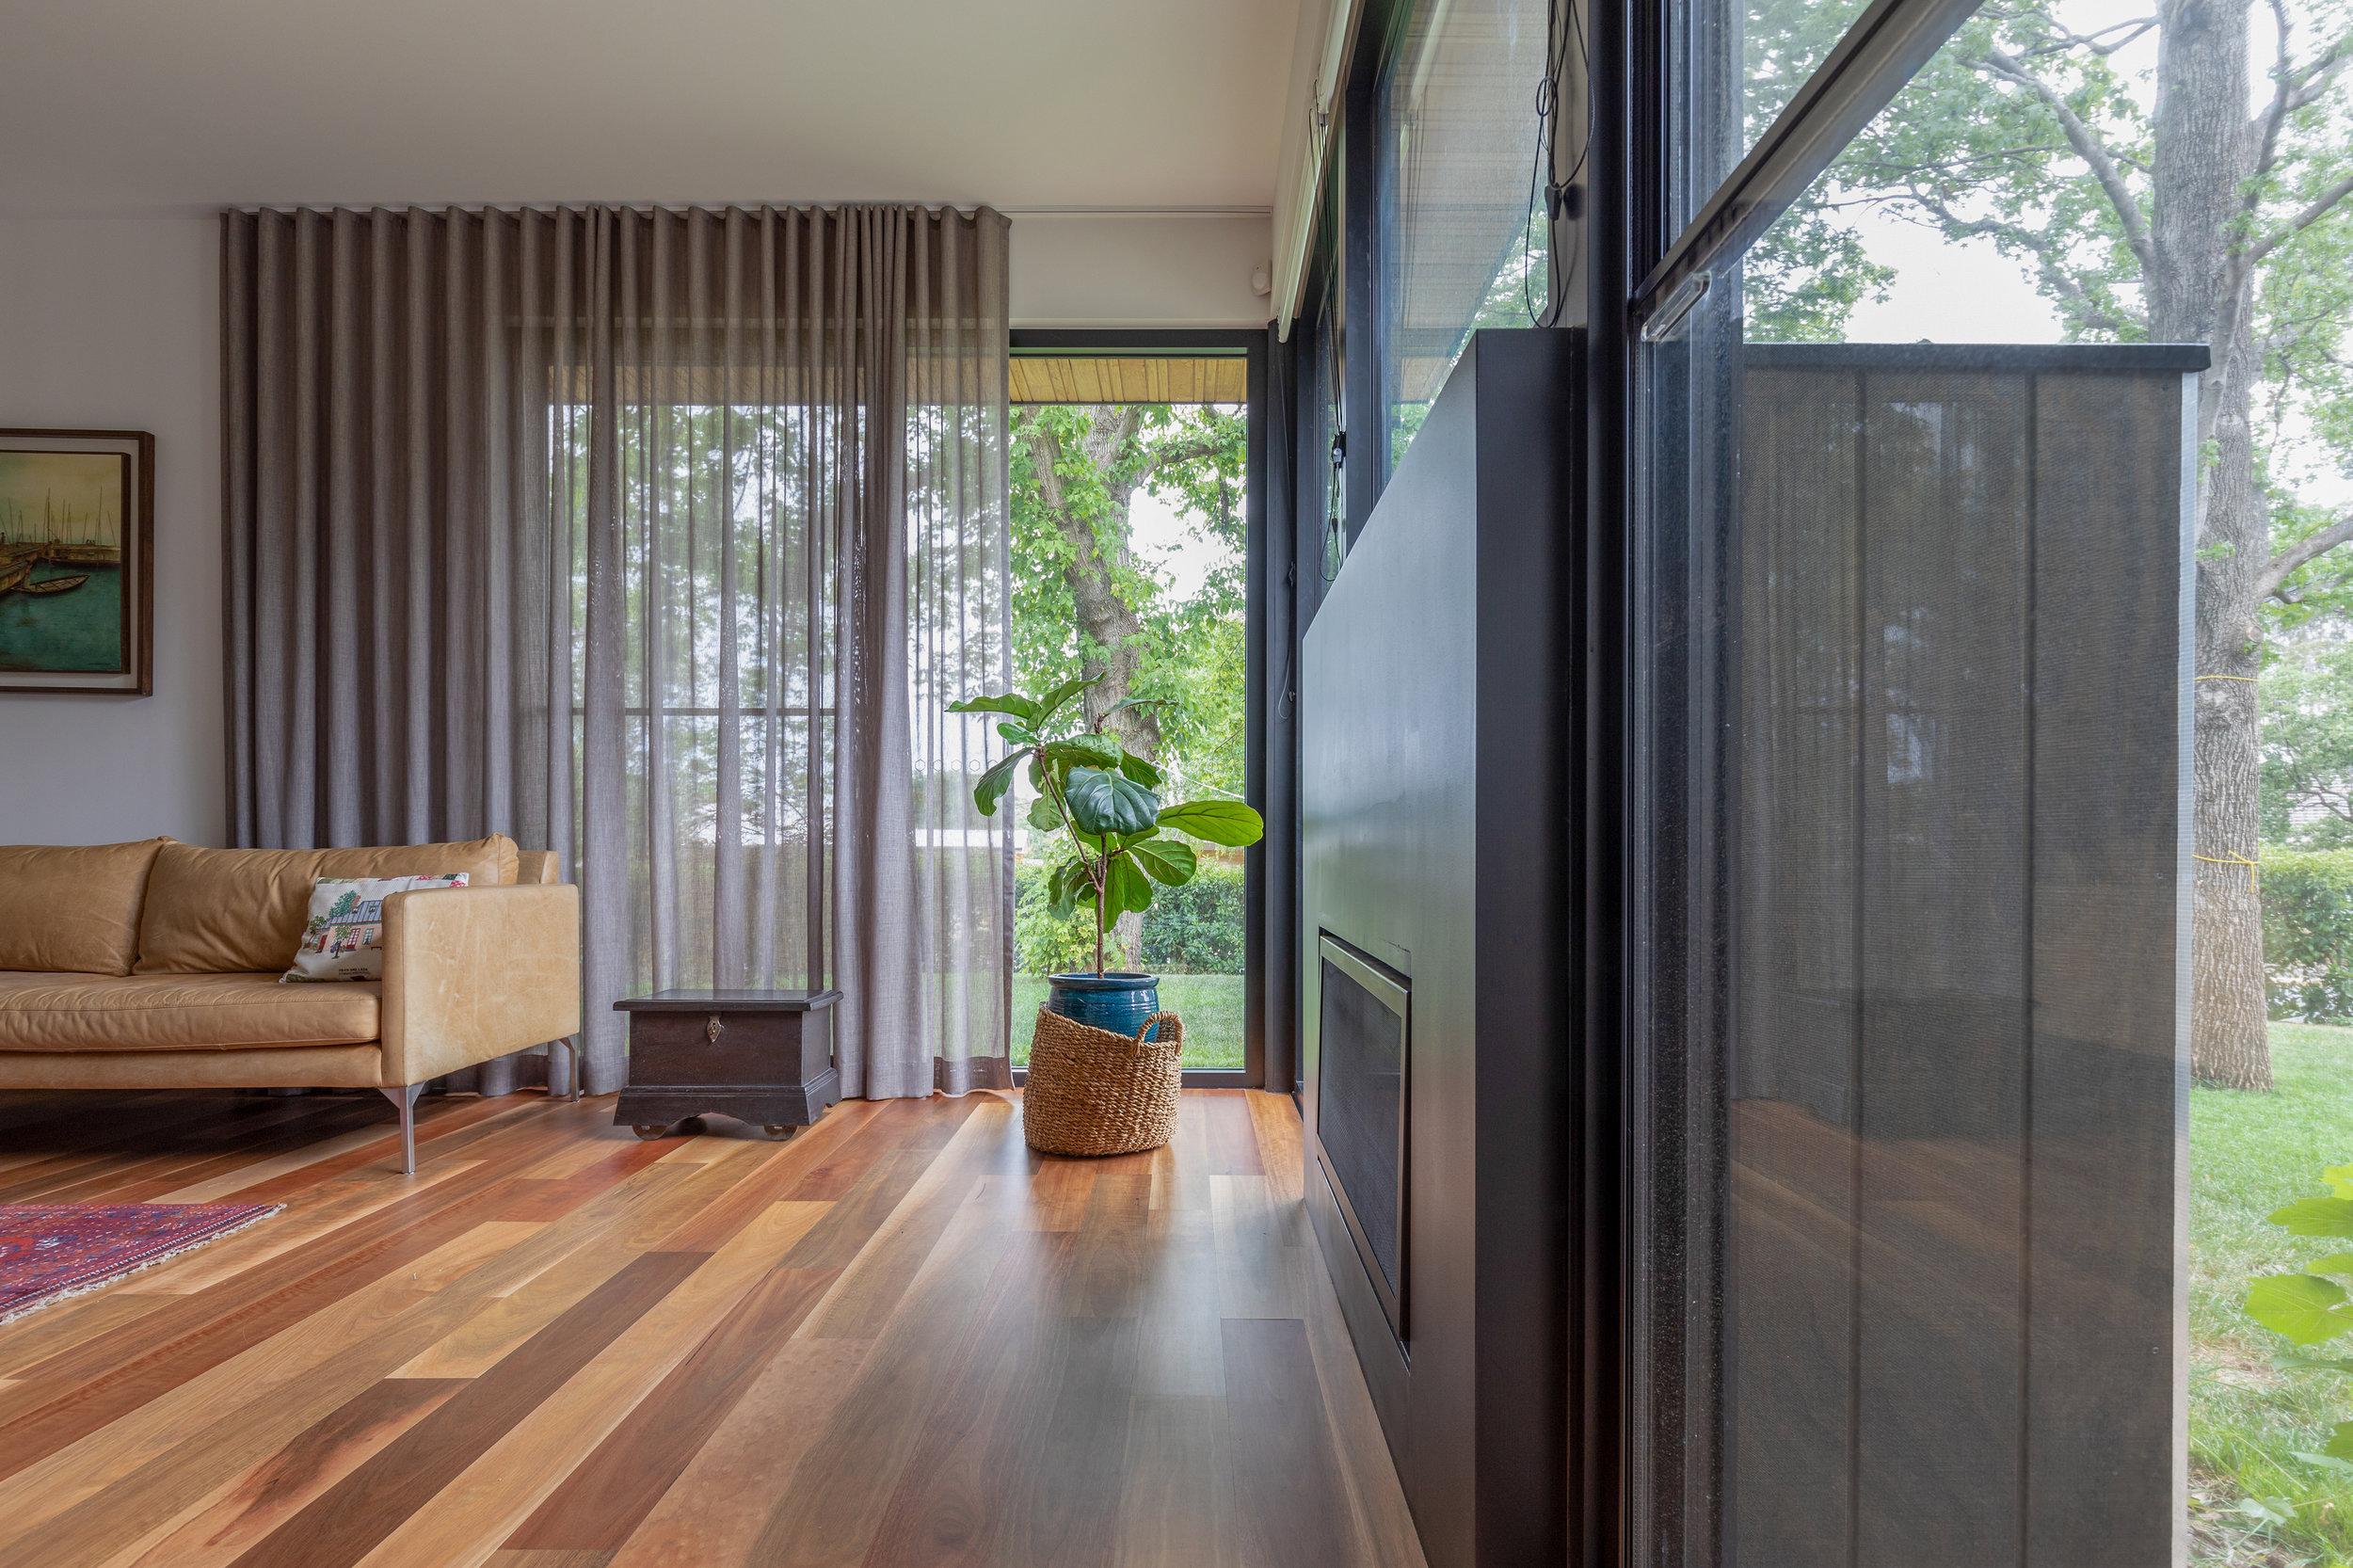 2917-resnew_Ribbon House_Rob Henry Architects_Light Studies_03.jpg